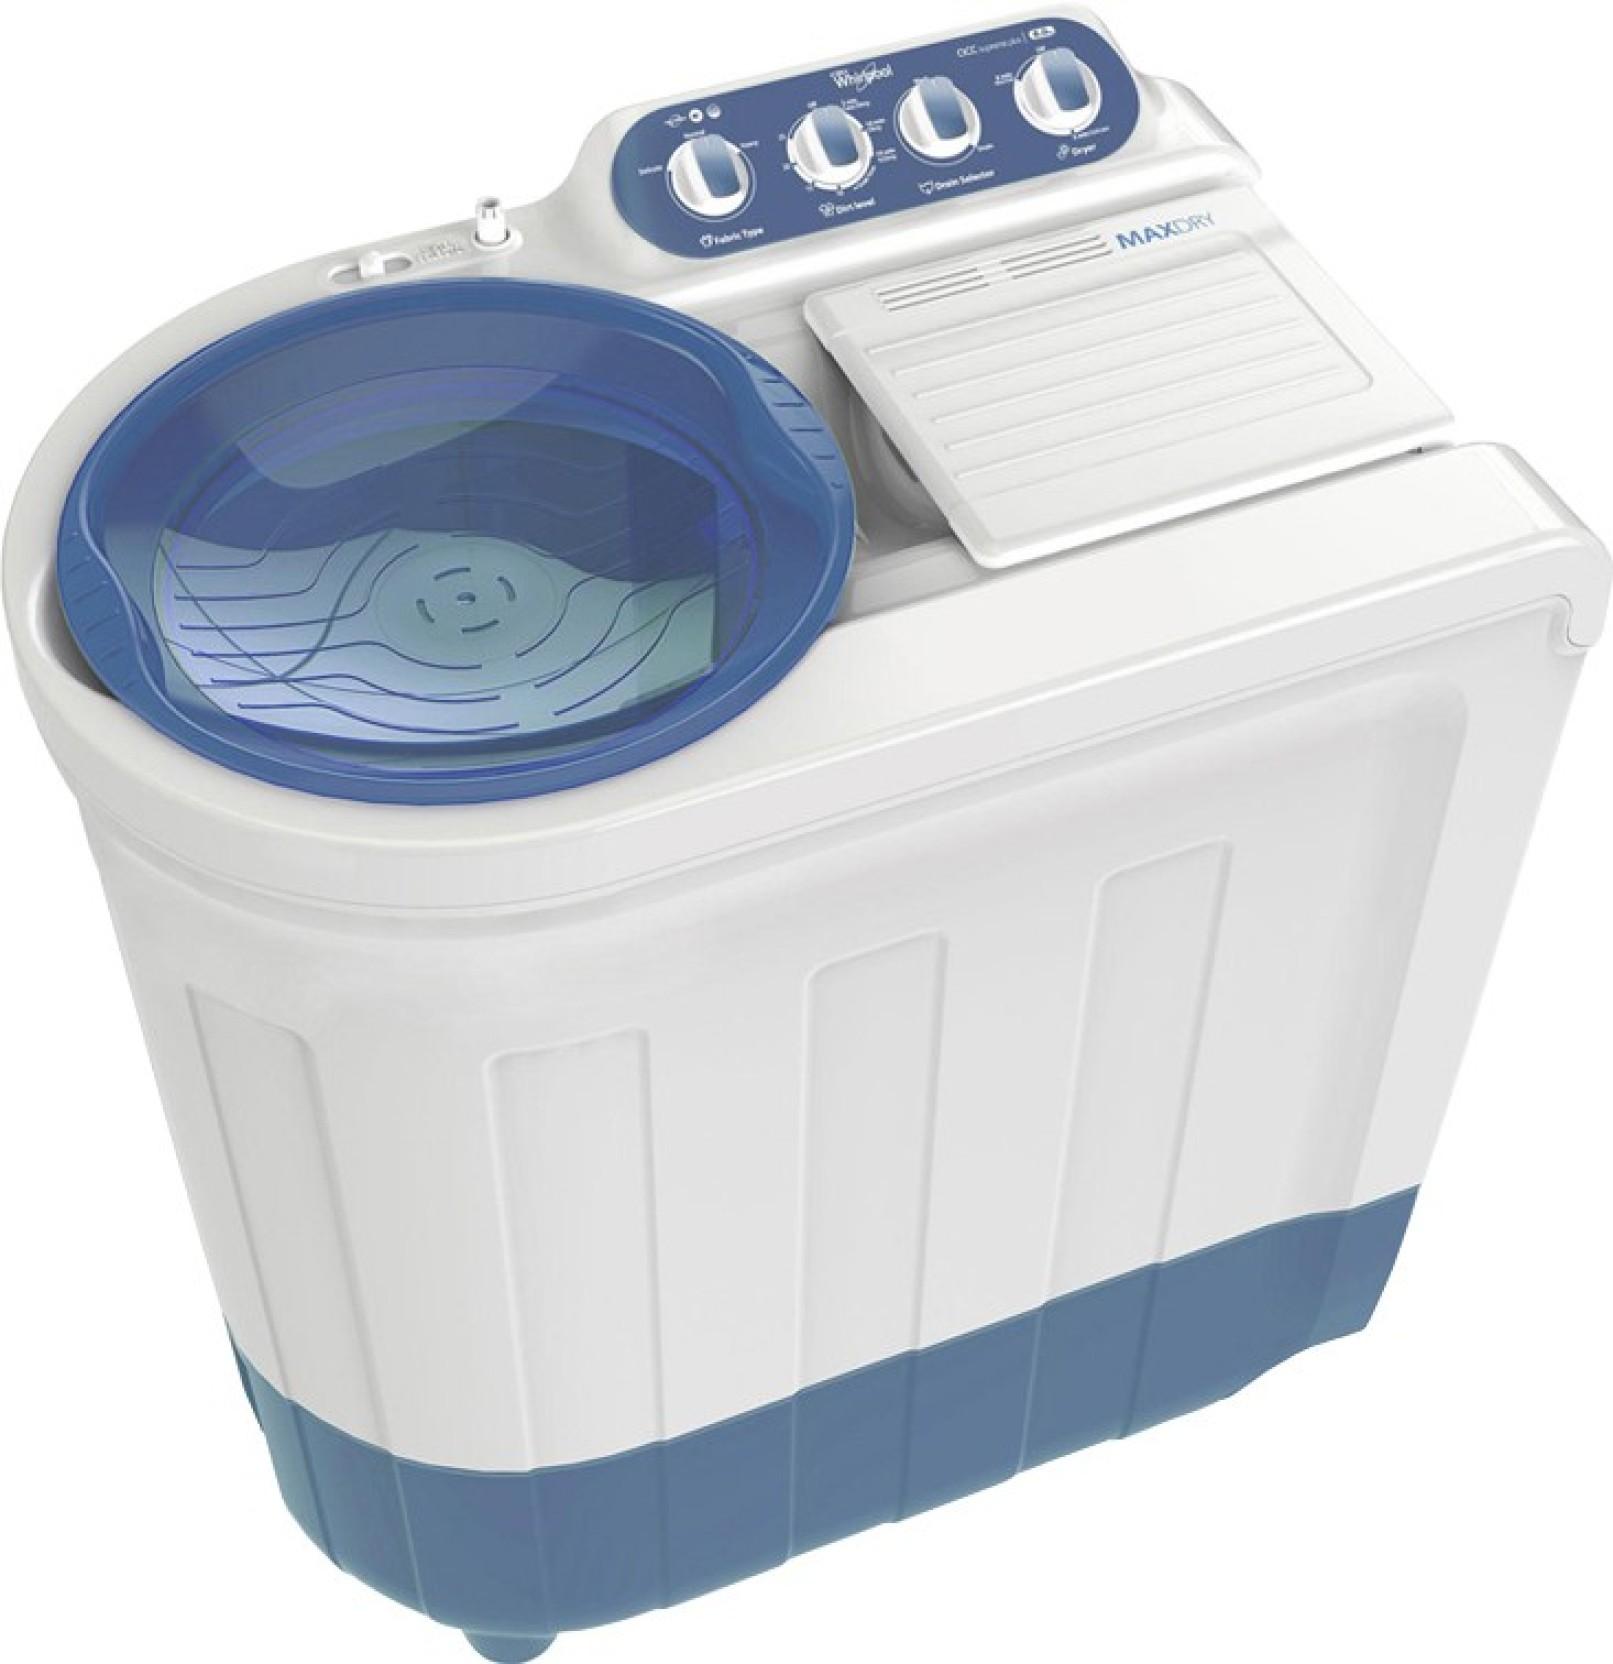 soak washing machine